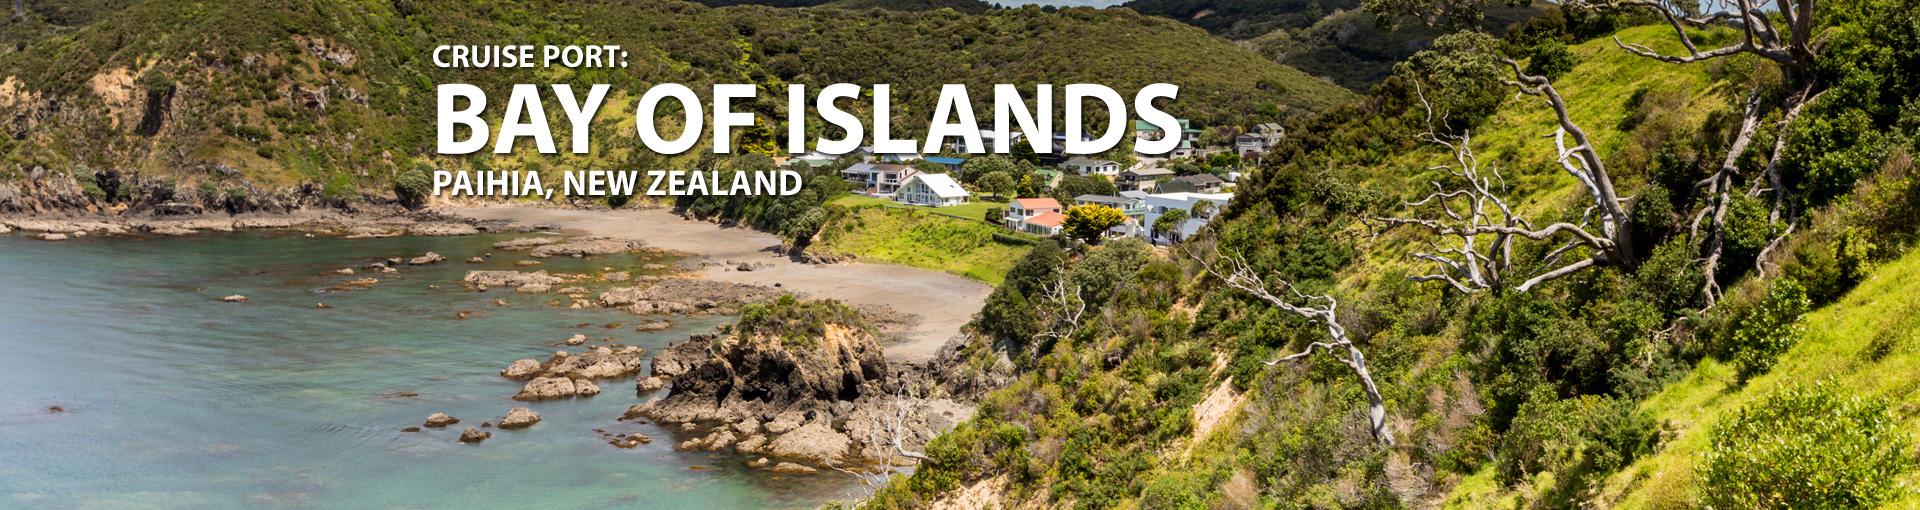 Cruises to Bay of Islands (Paihia), New Zealand